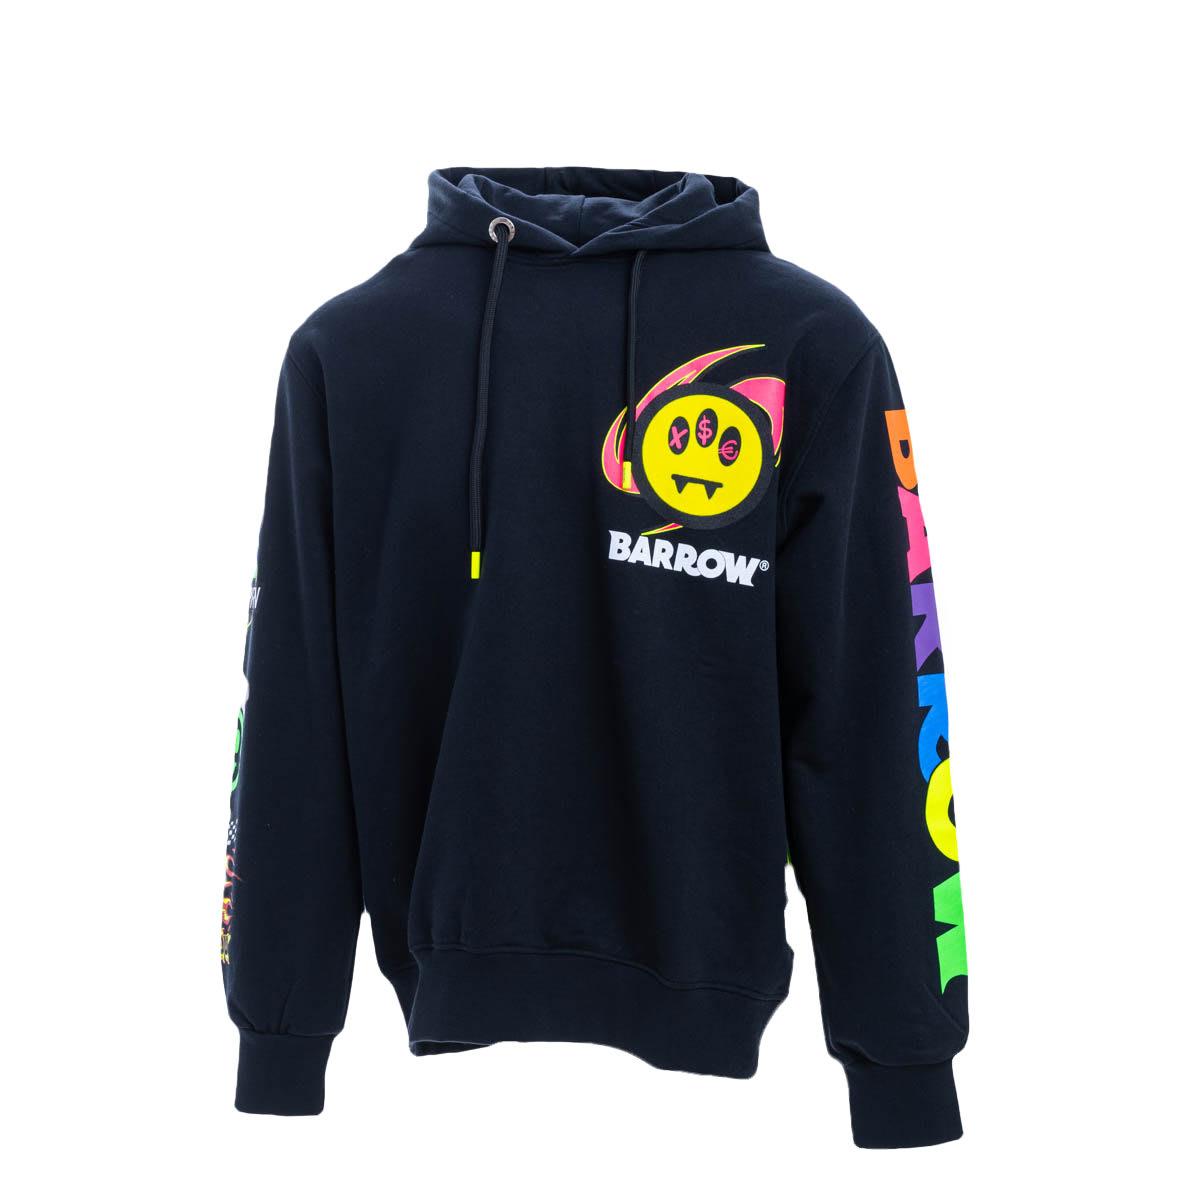 Barrow Cotton Sweatshirt In Black